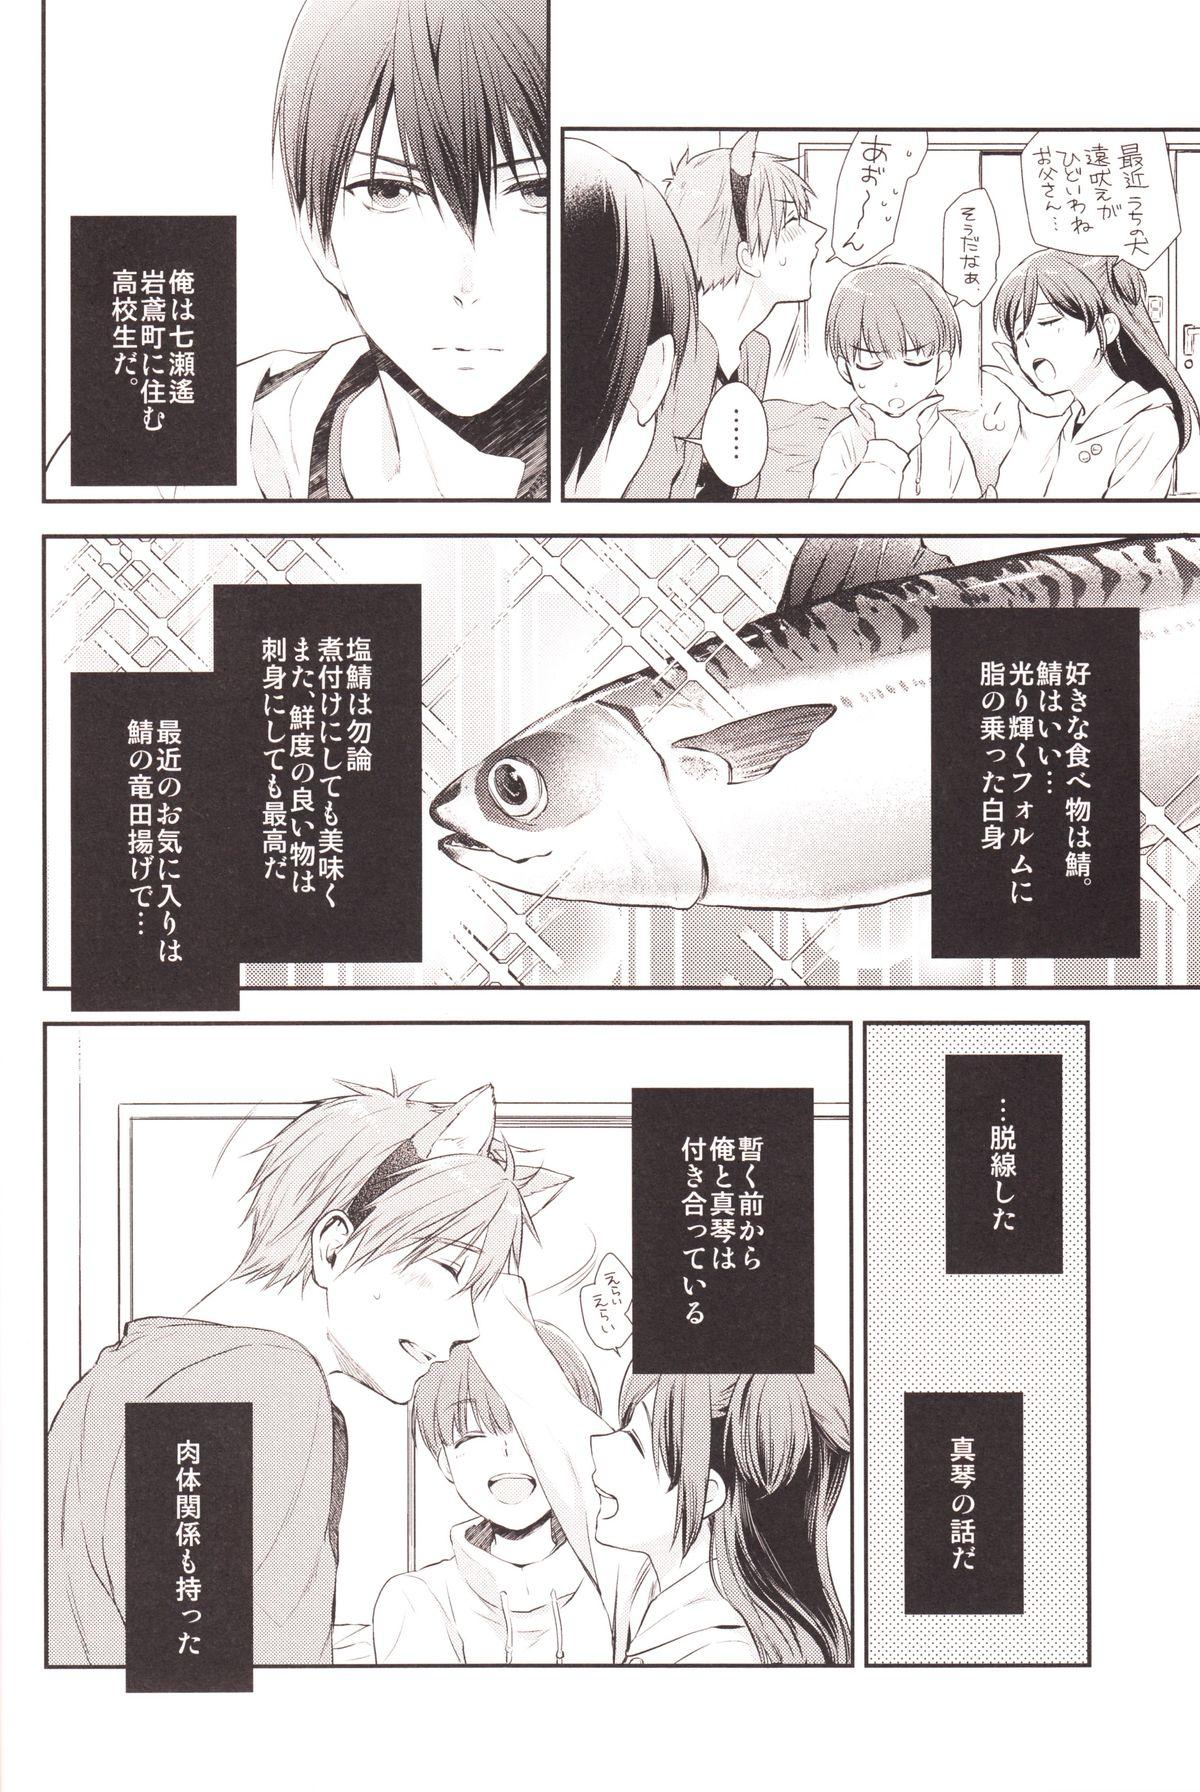 Haru-chan no Wanko 8